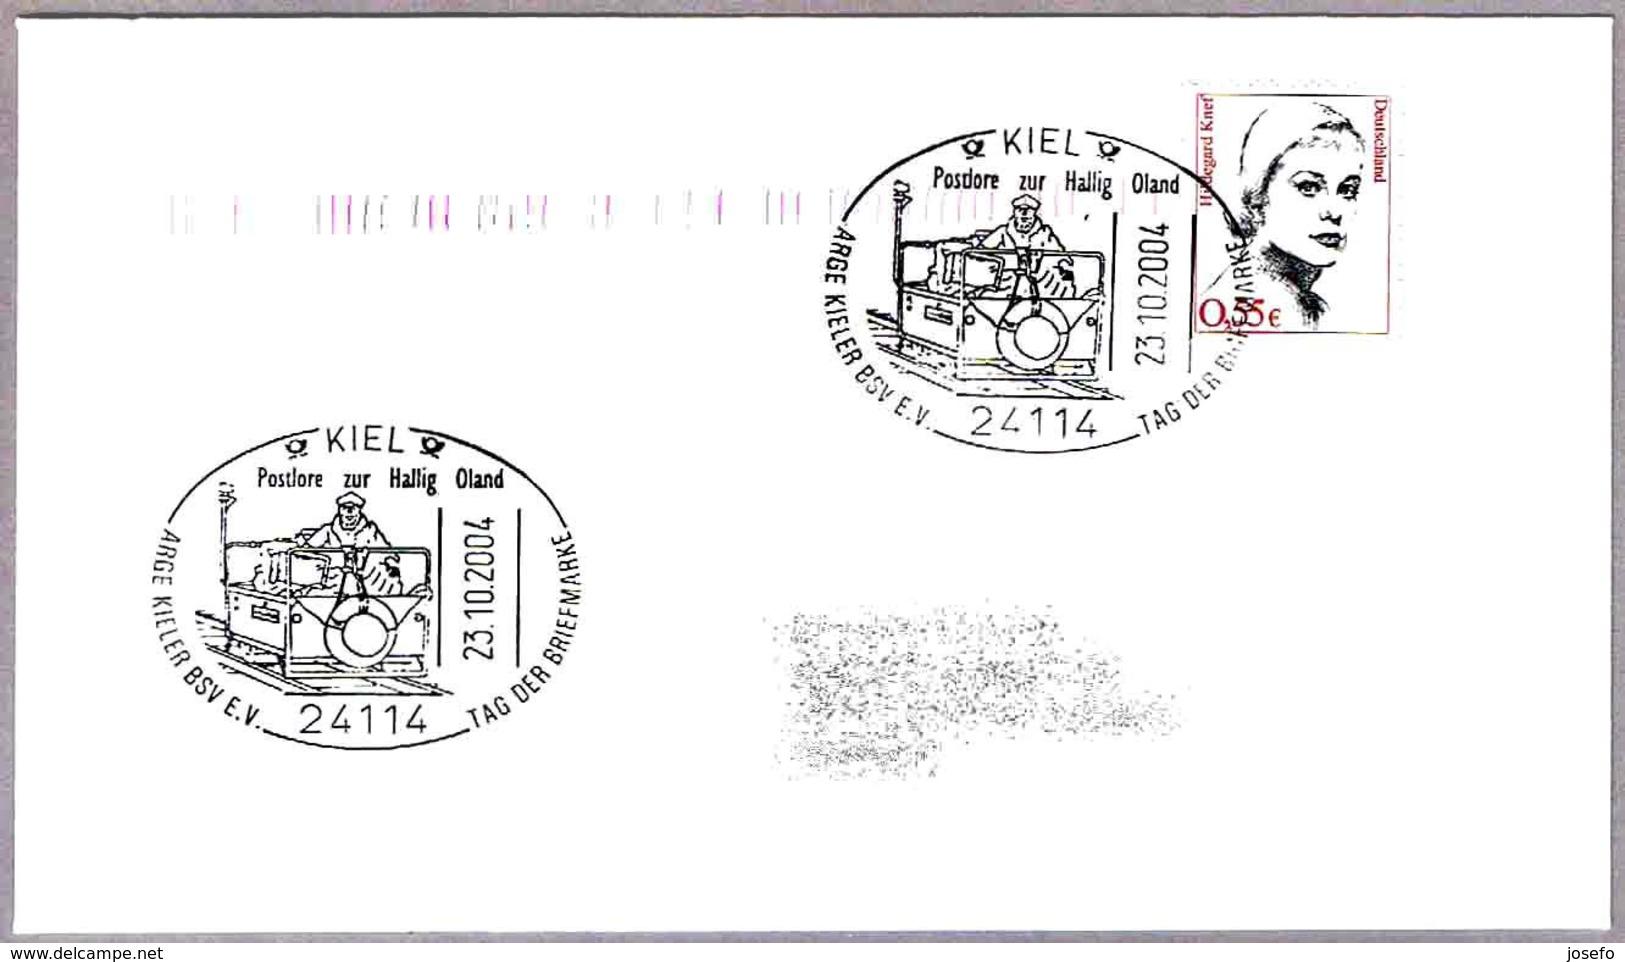 TRANSPORTE POSTAL - POSTLORE ZUR HALLIG OLAND. Kiel 2004 - Correo Postal